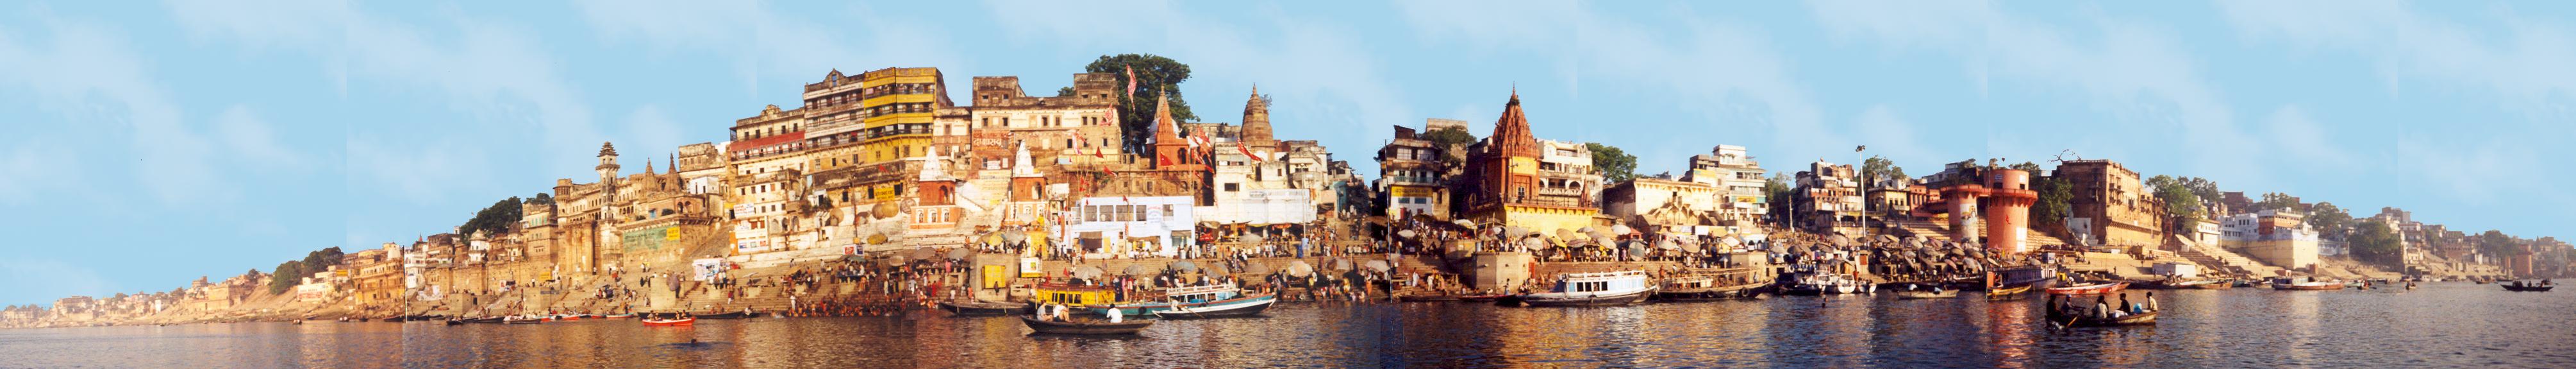 Varanasi alias Banaras